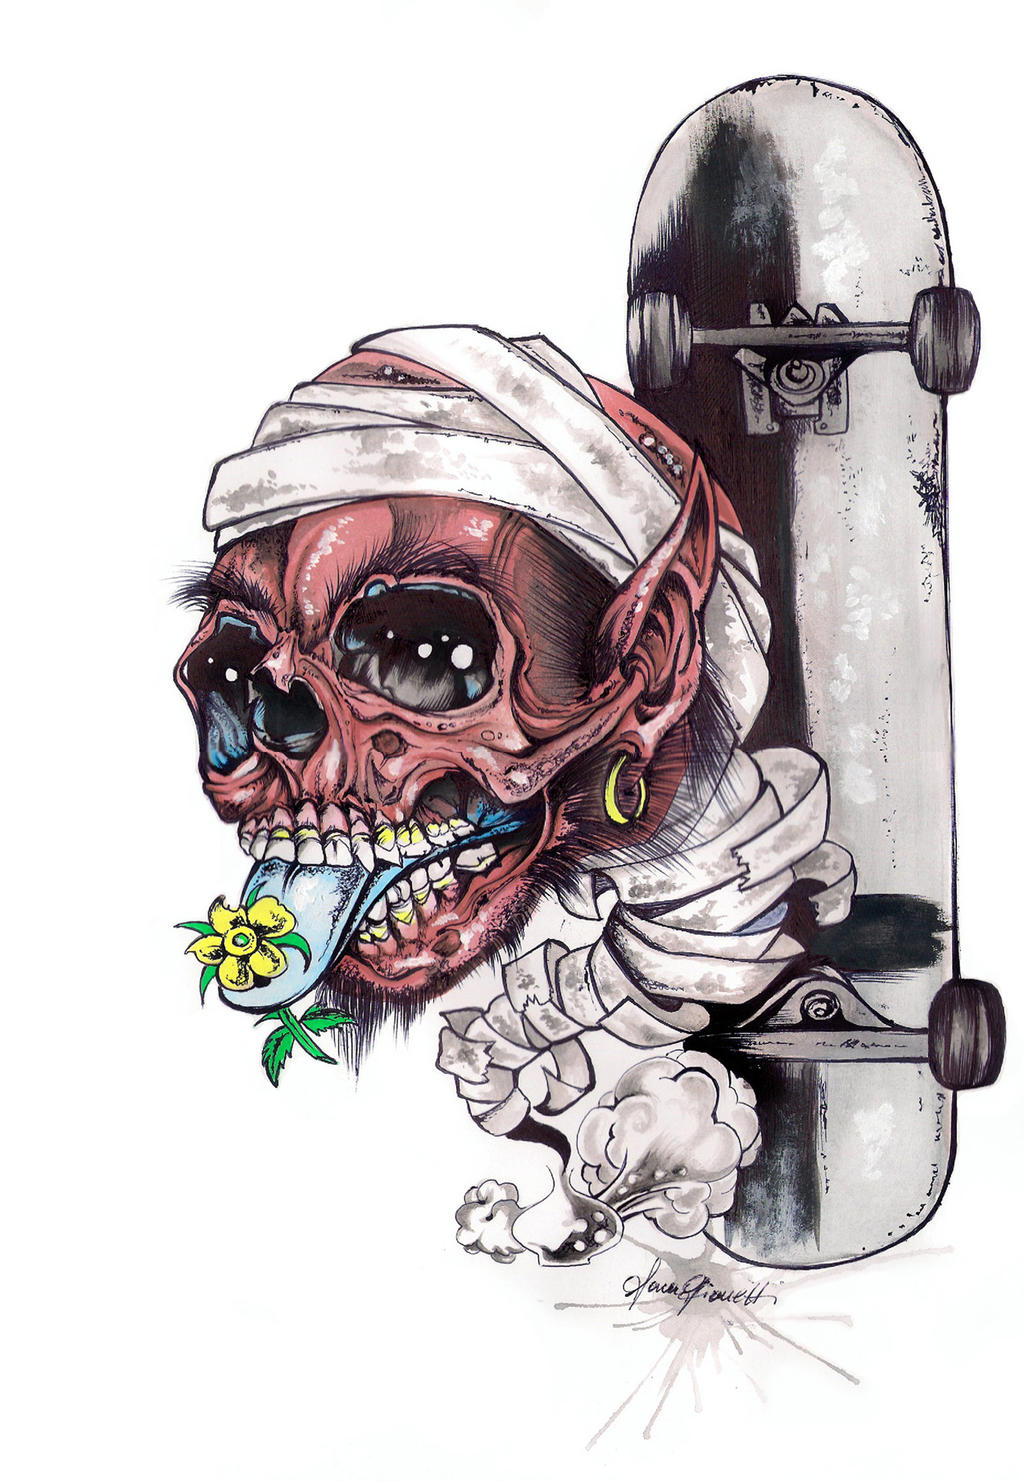 Skull by Gionetti